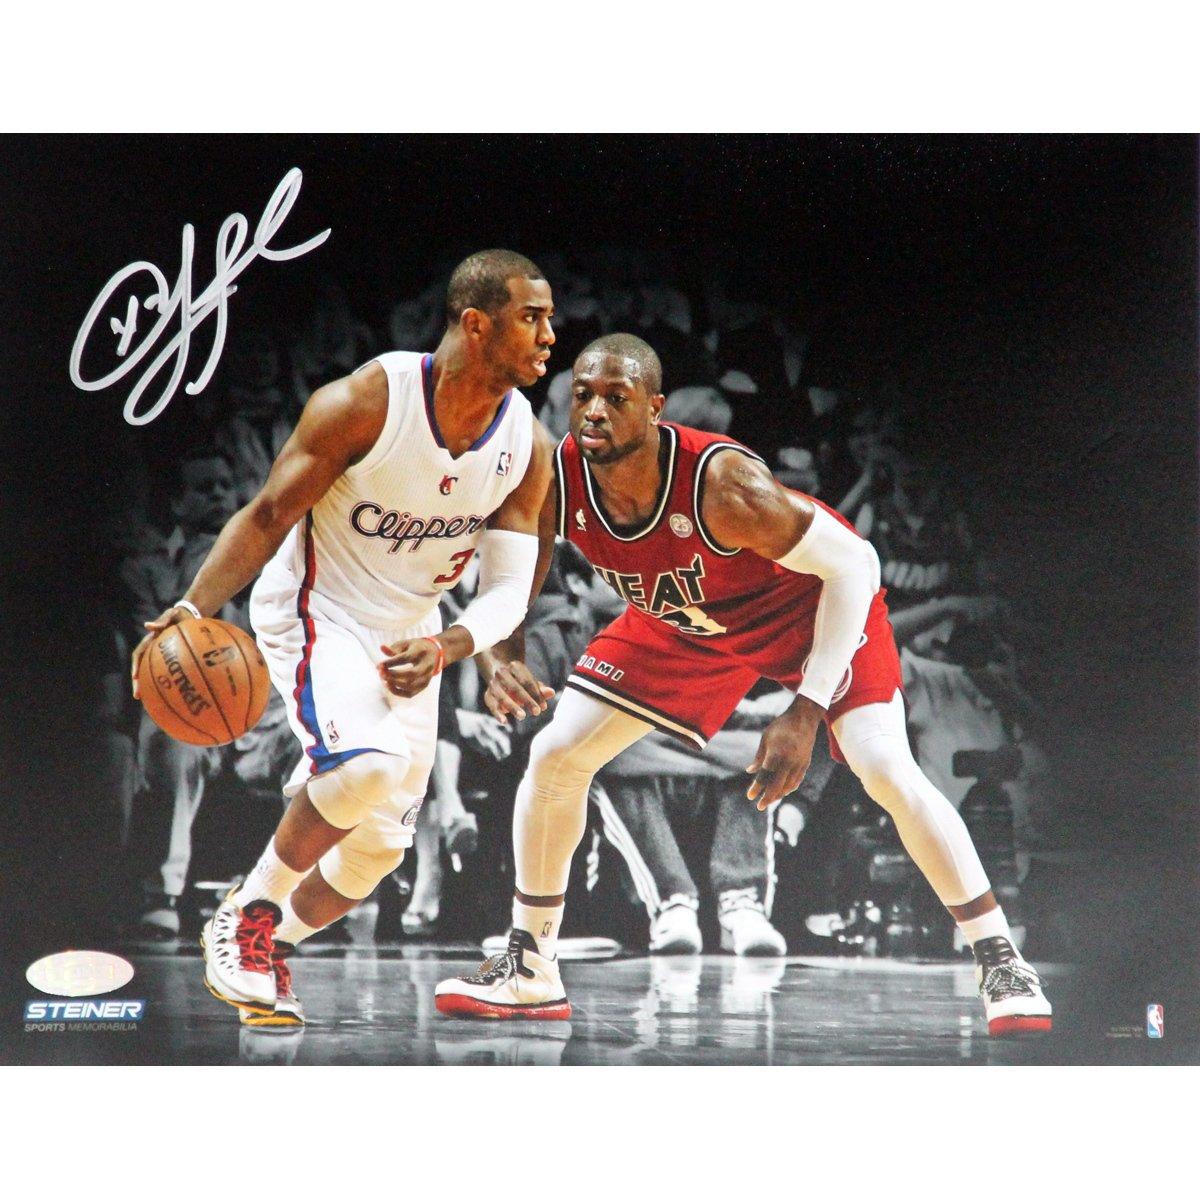 NBA Los Angeles Clippers Chris Paul vs Dwayne Wade Signed Photo, 8 x 10-Feet